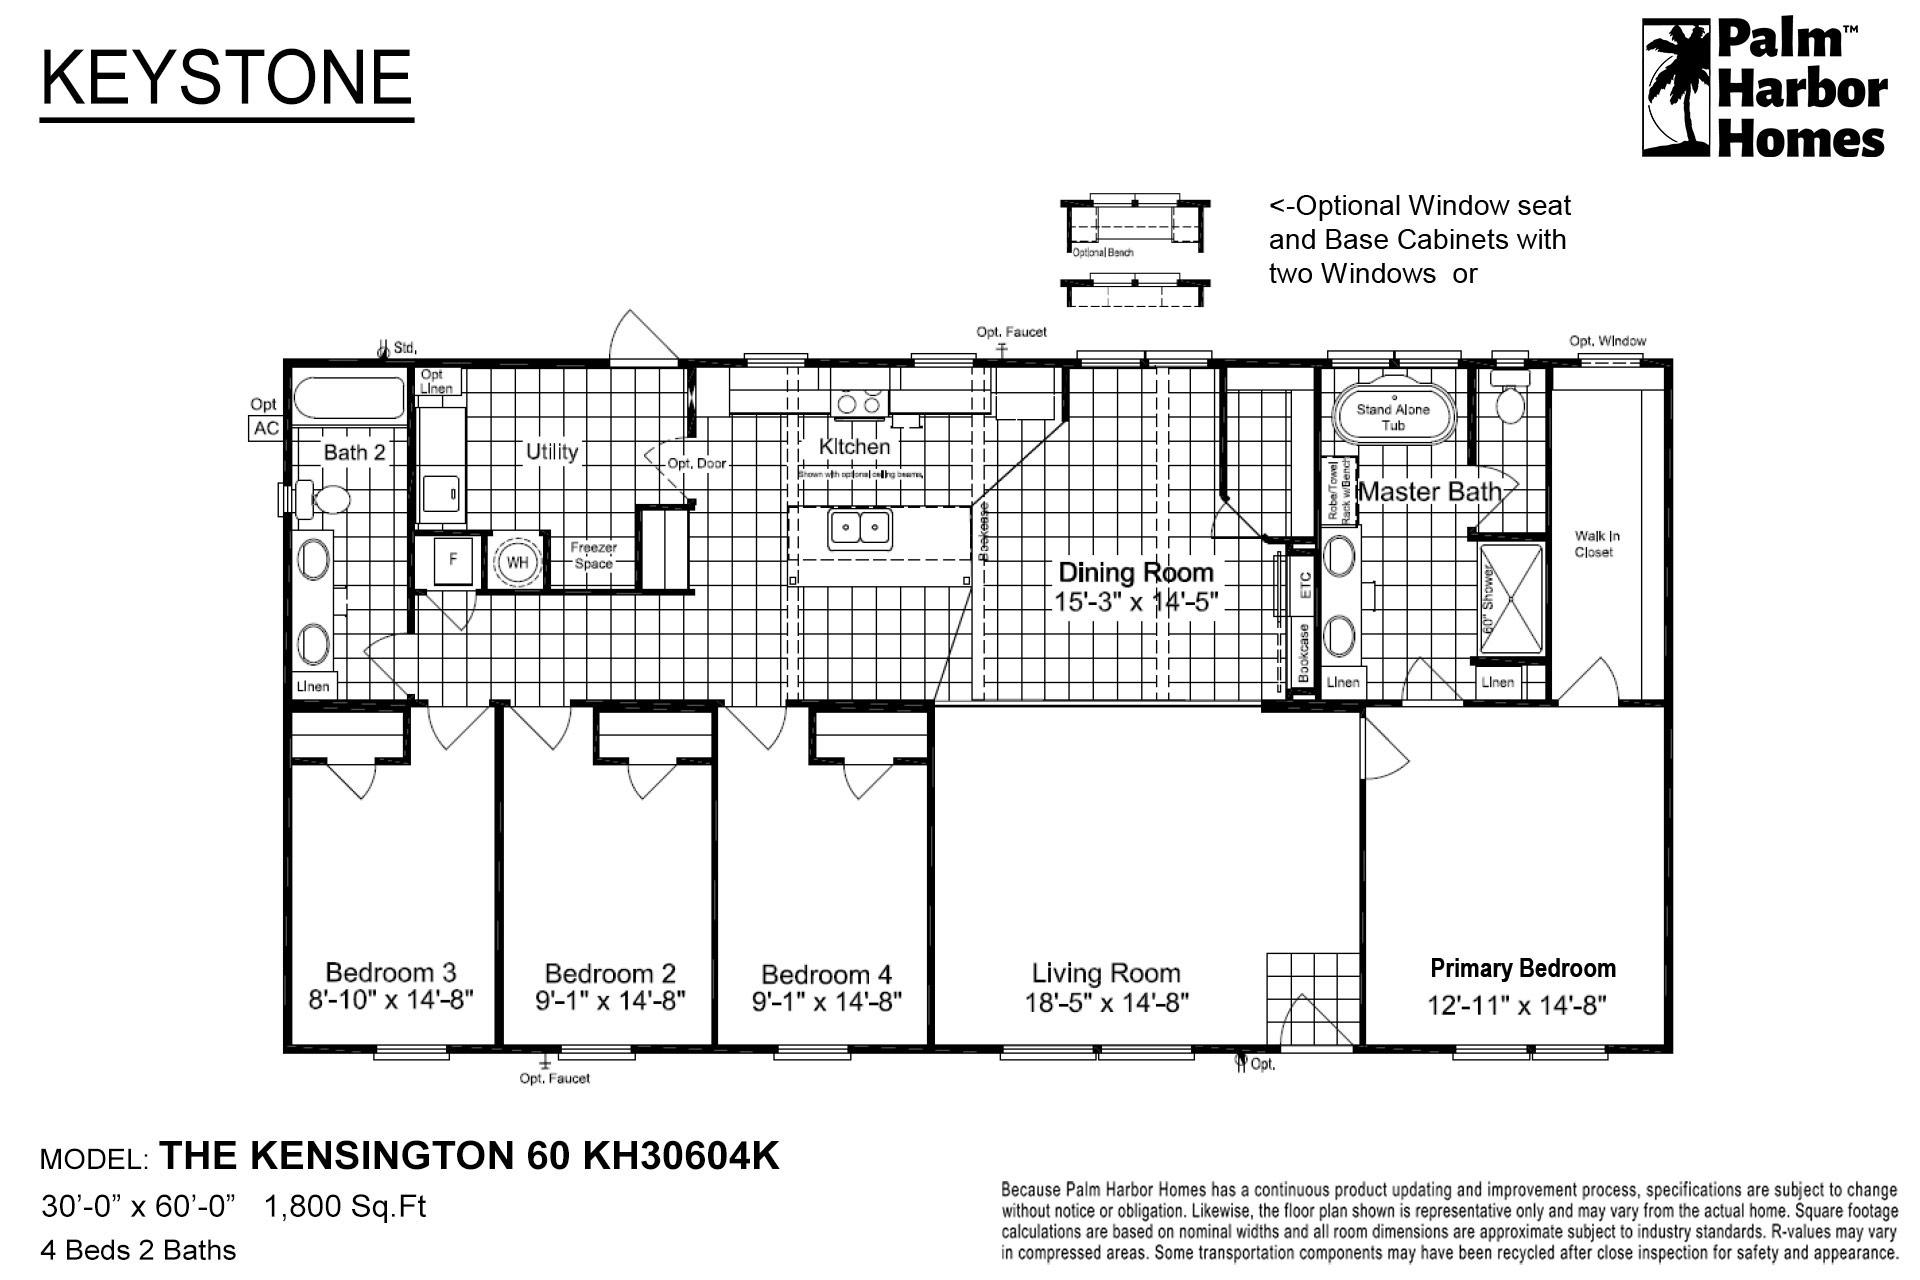 Keystone - The Kensington 60 KH30604K